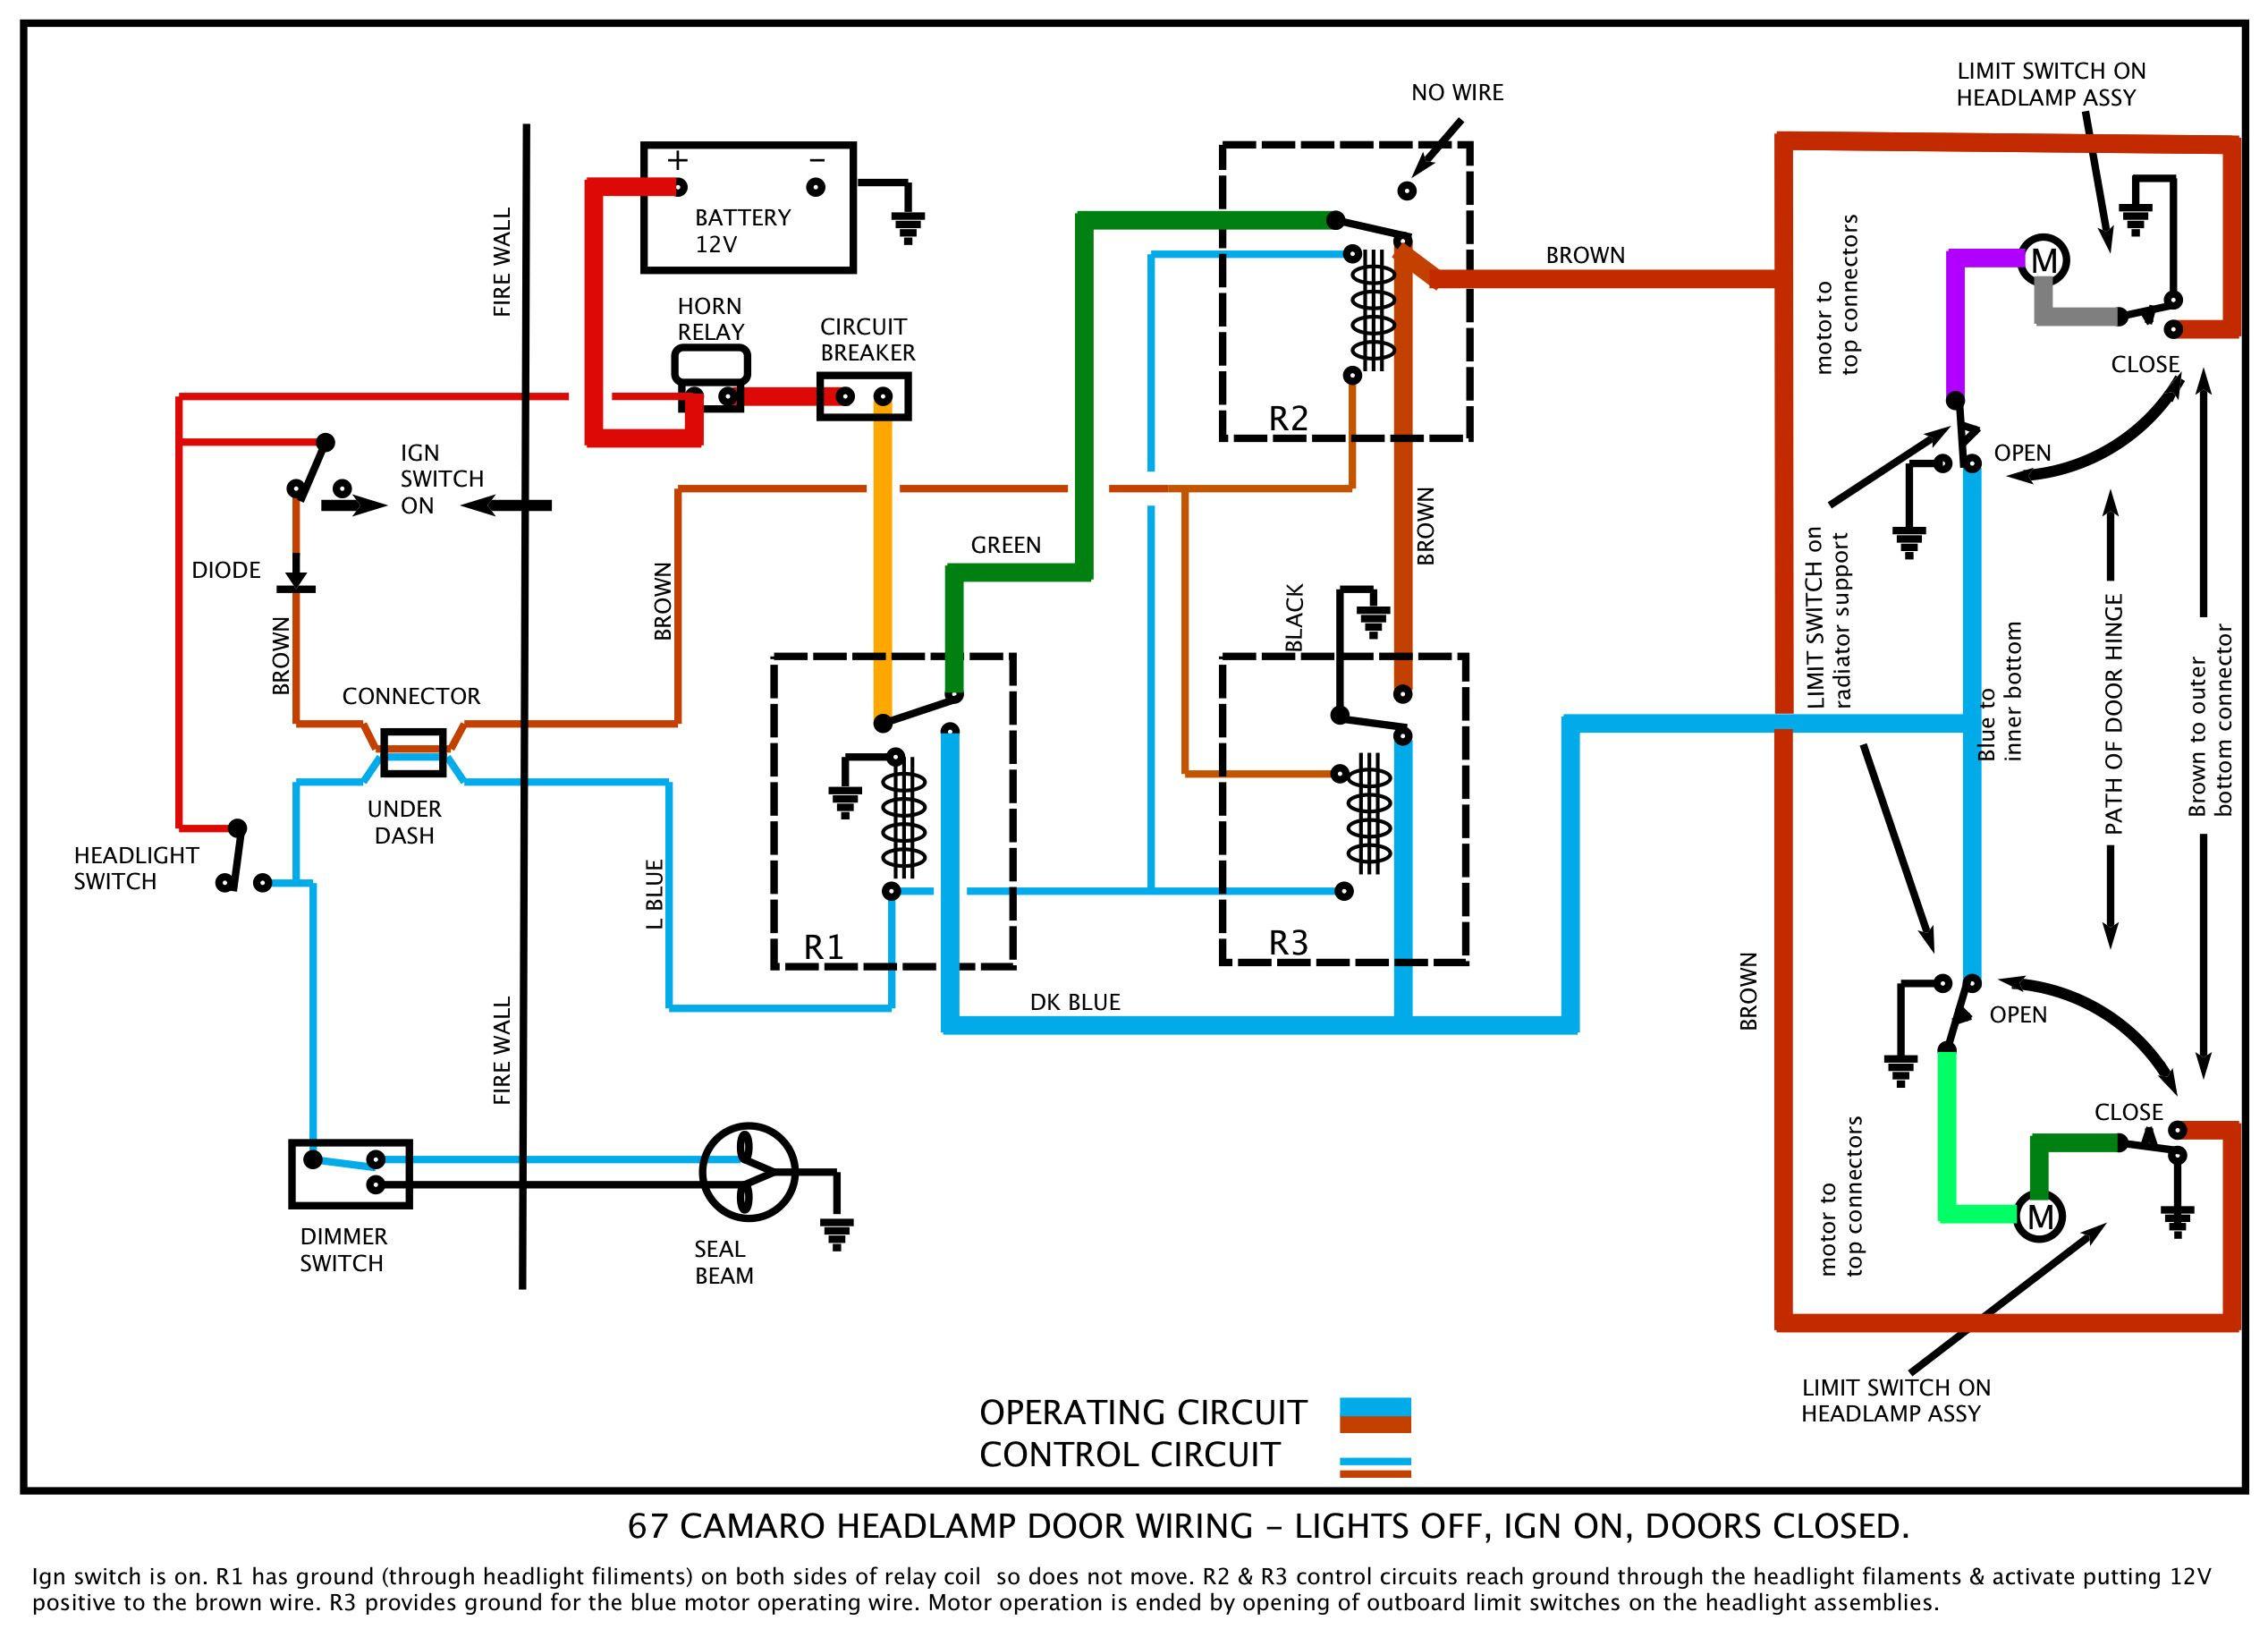 68 chevy camaro ignition switch wiring diagram - weil mclain thermostat wiring  diagram - coded-03.cukk.jeanjaures37.fr  wiring diagram resource